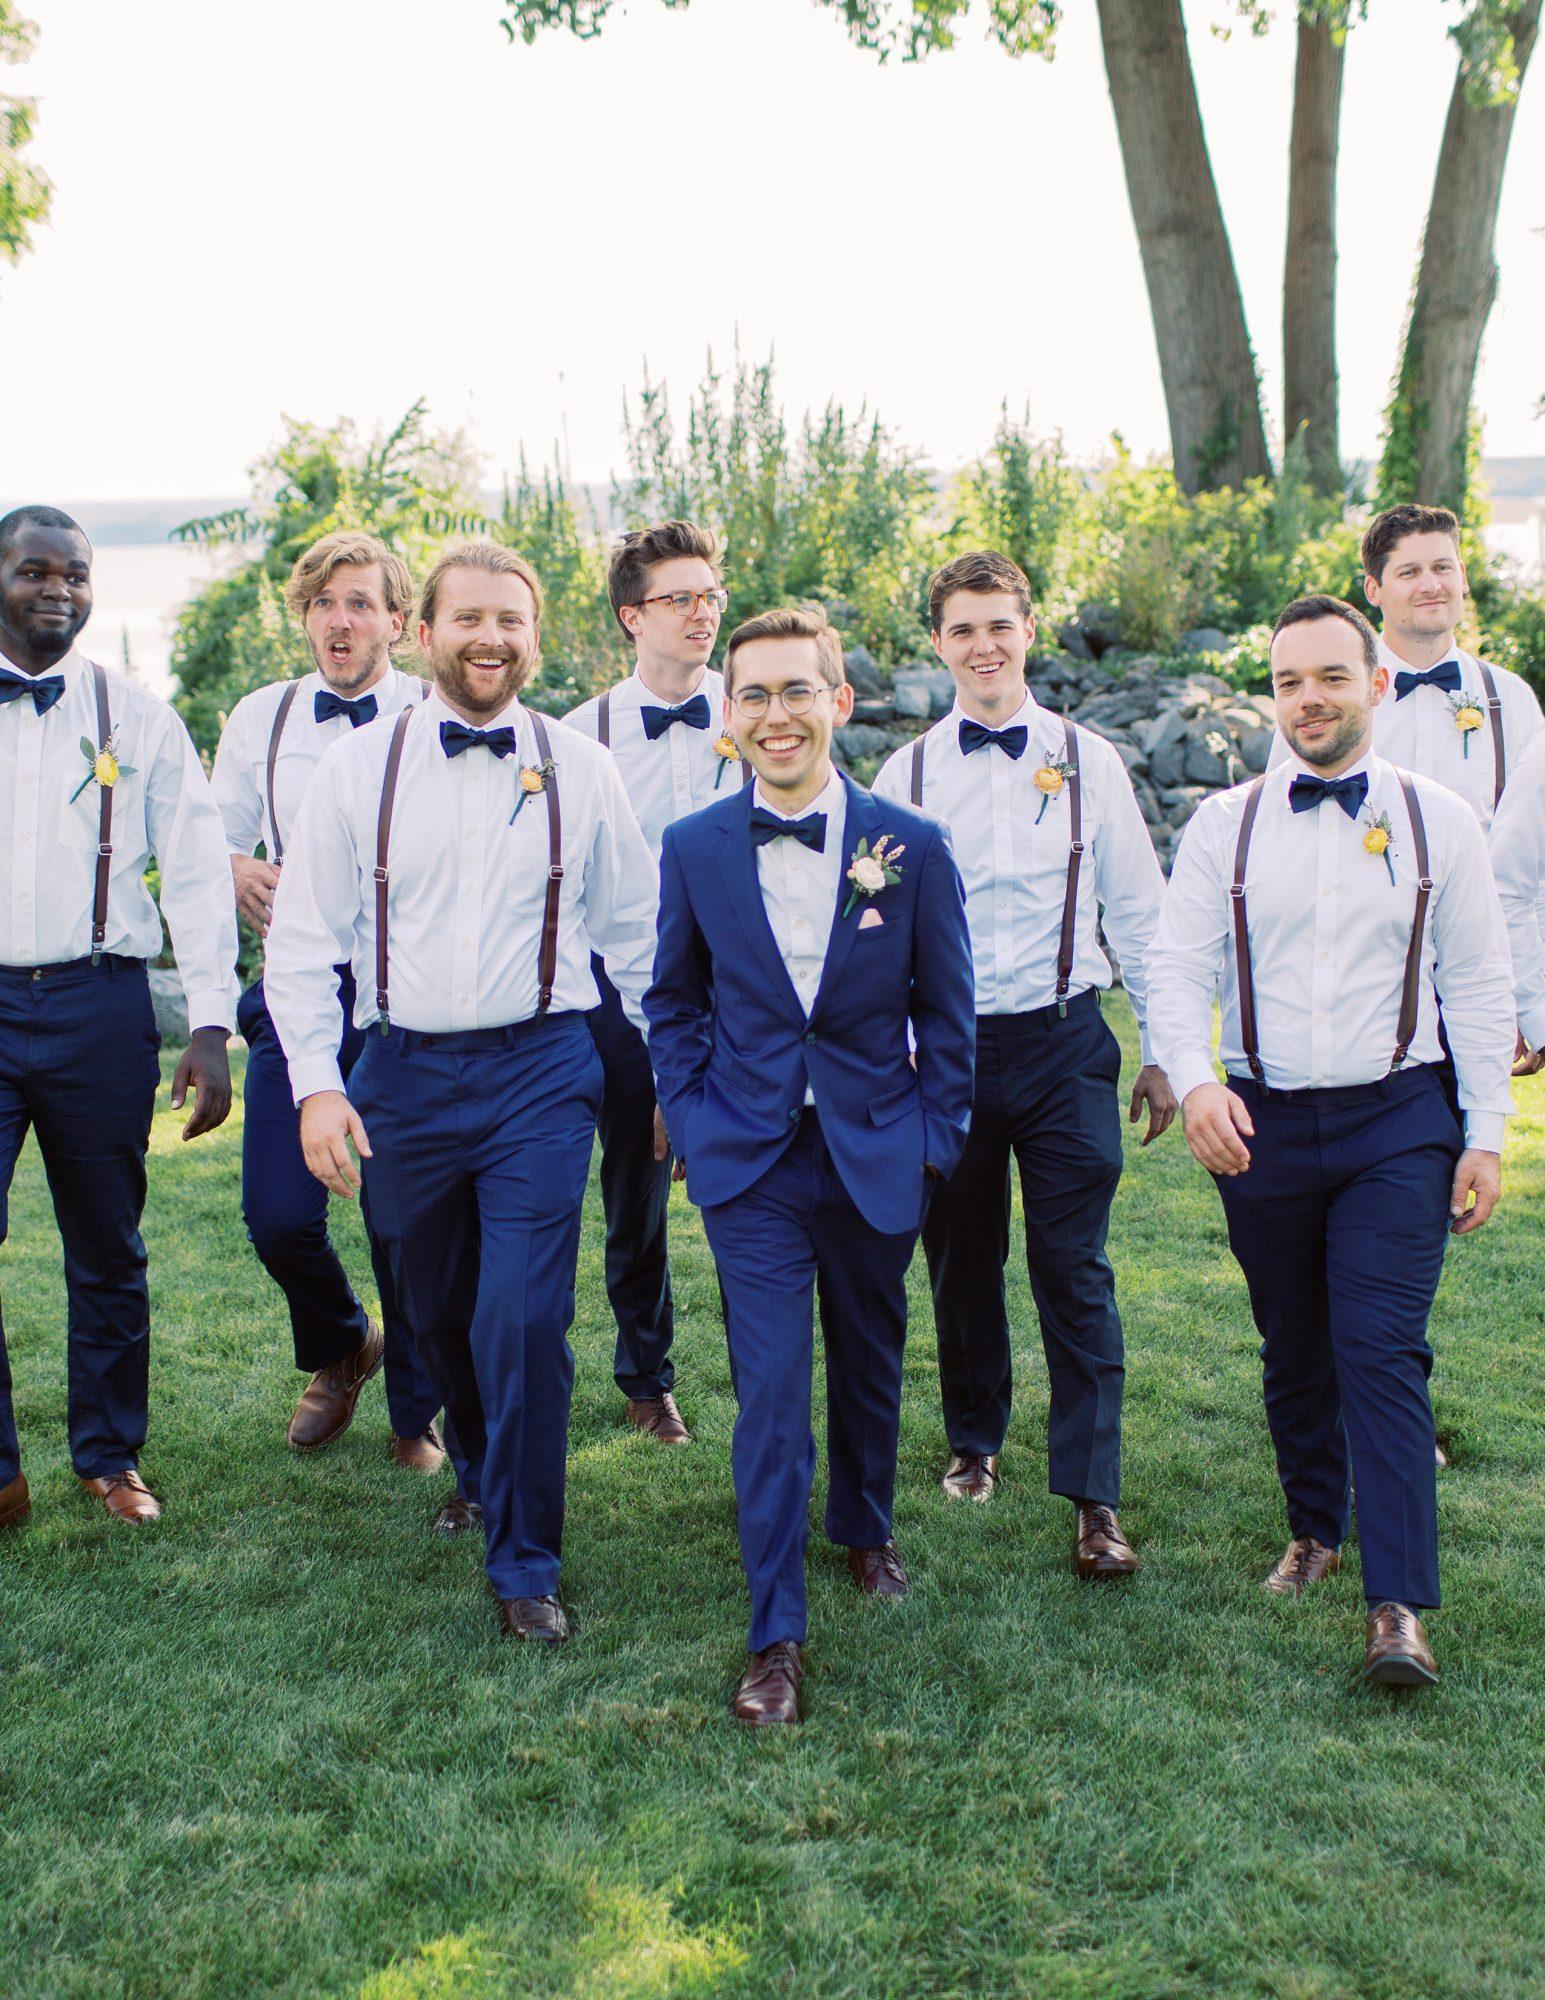 charlene jeremy wedding groom and groomsmen portrait